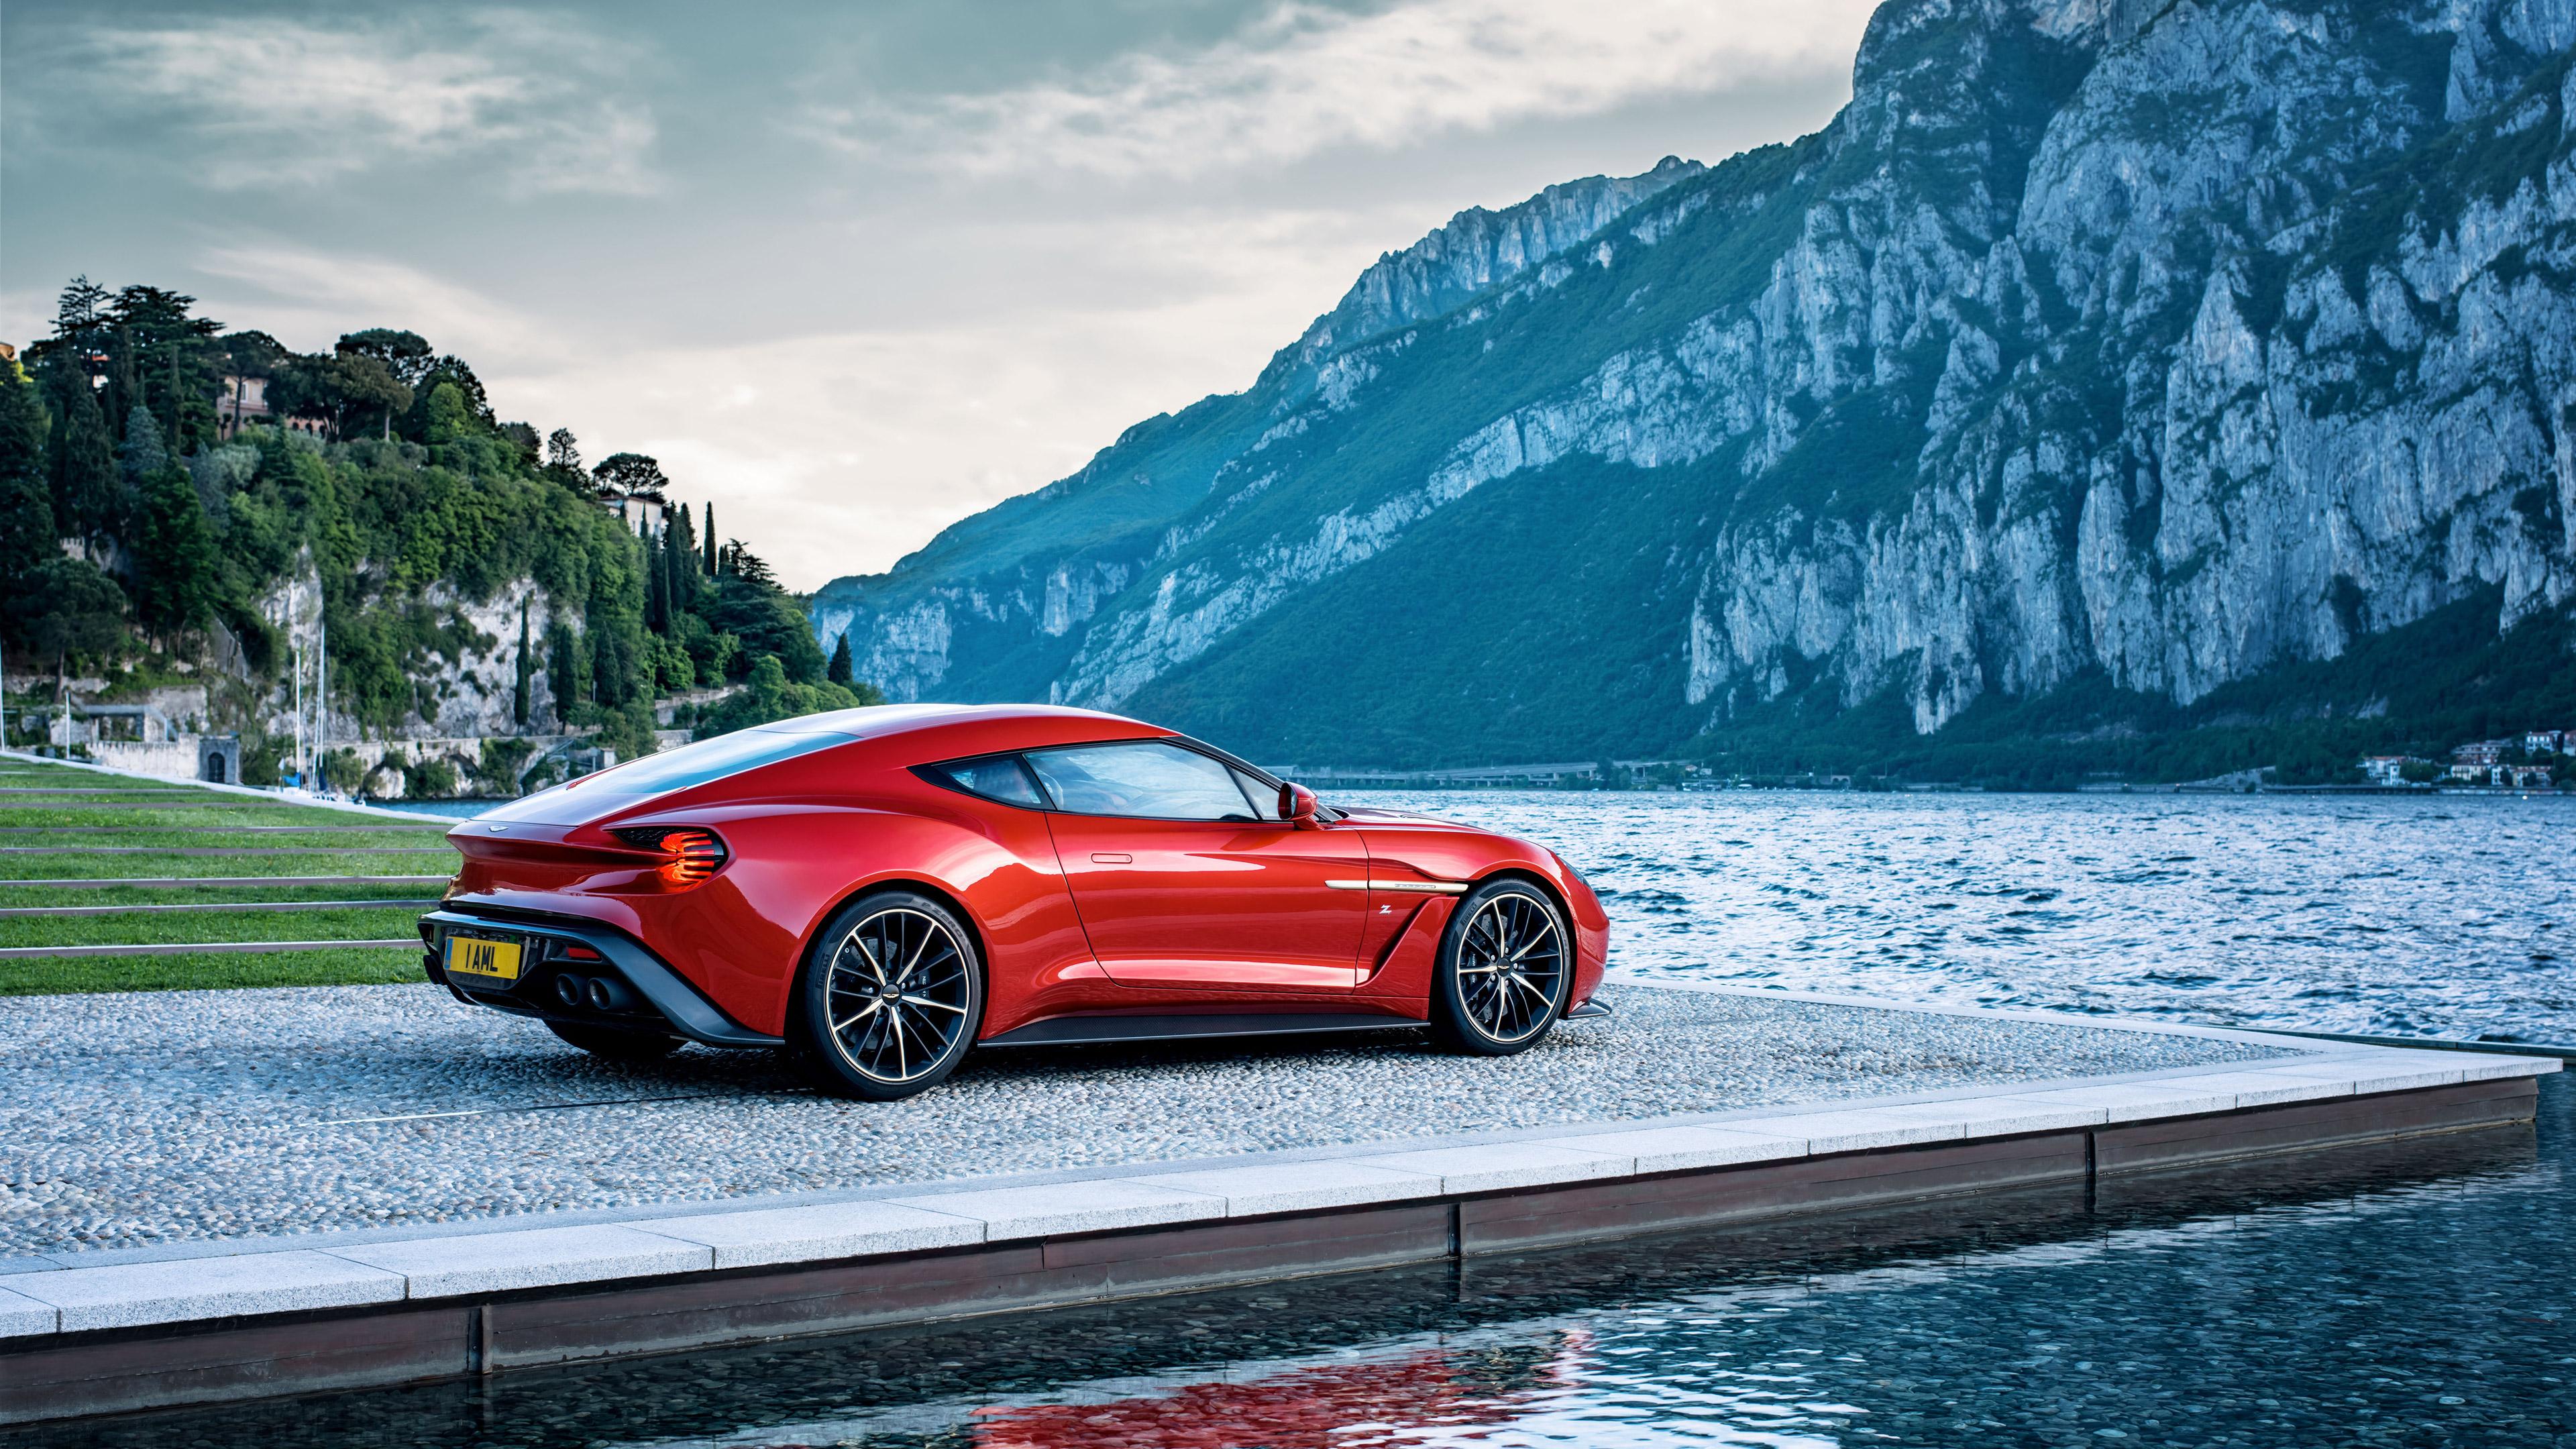 Wallpapers Aston Martin Zagato